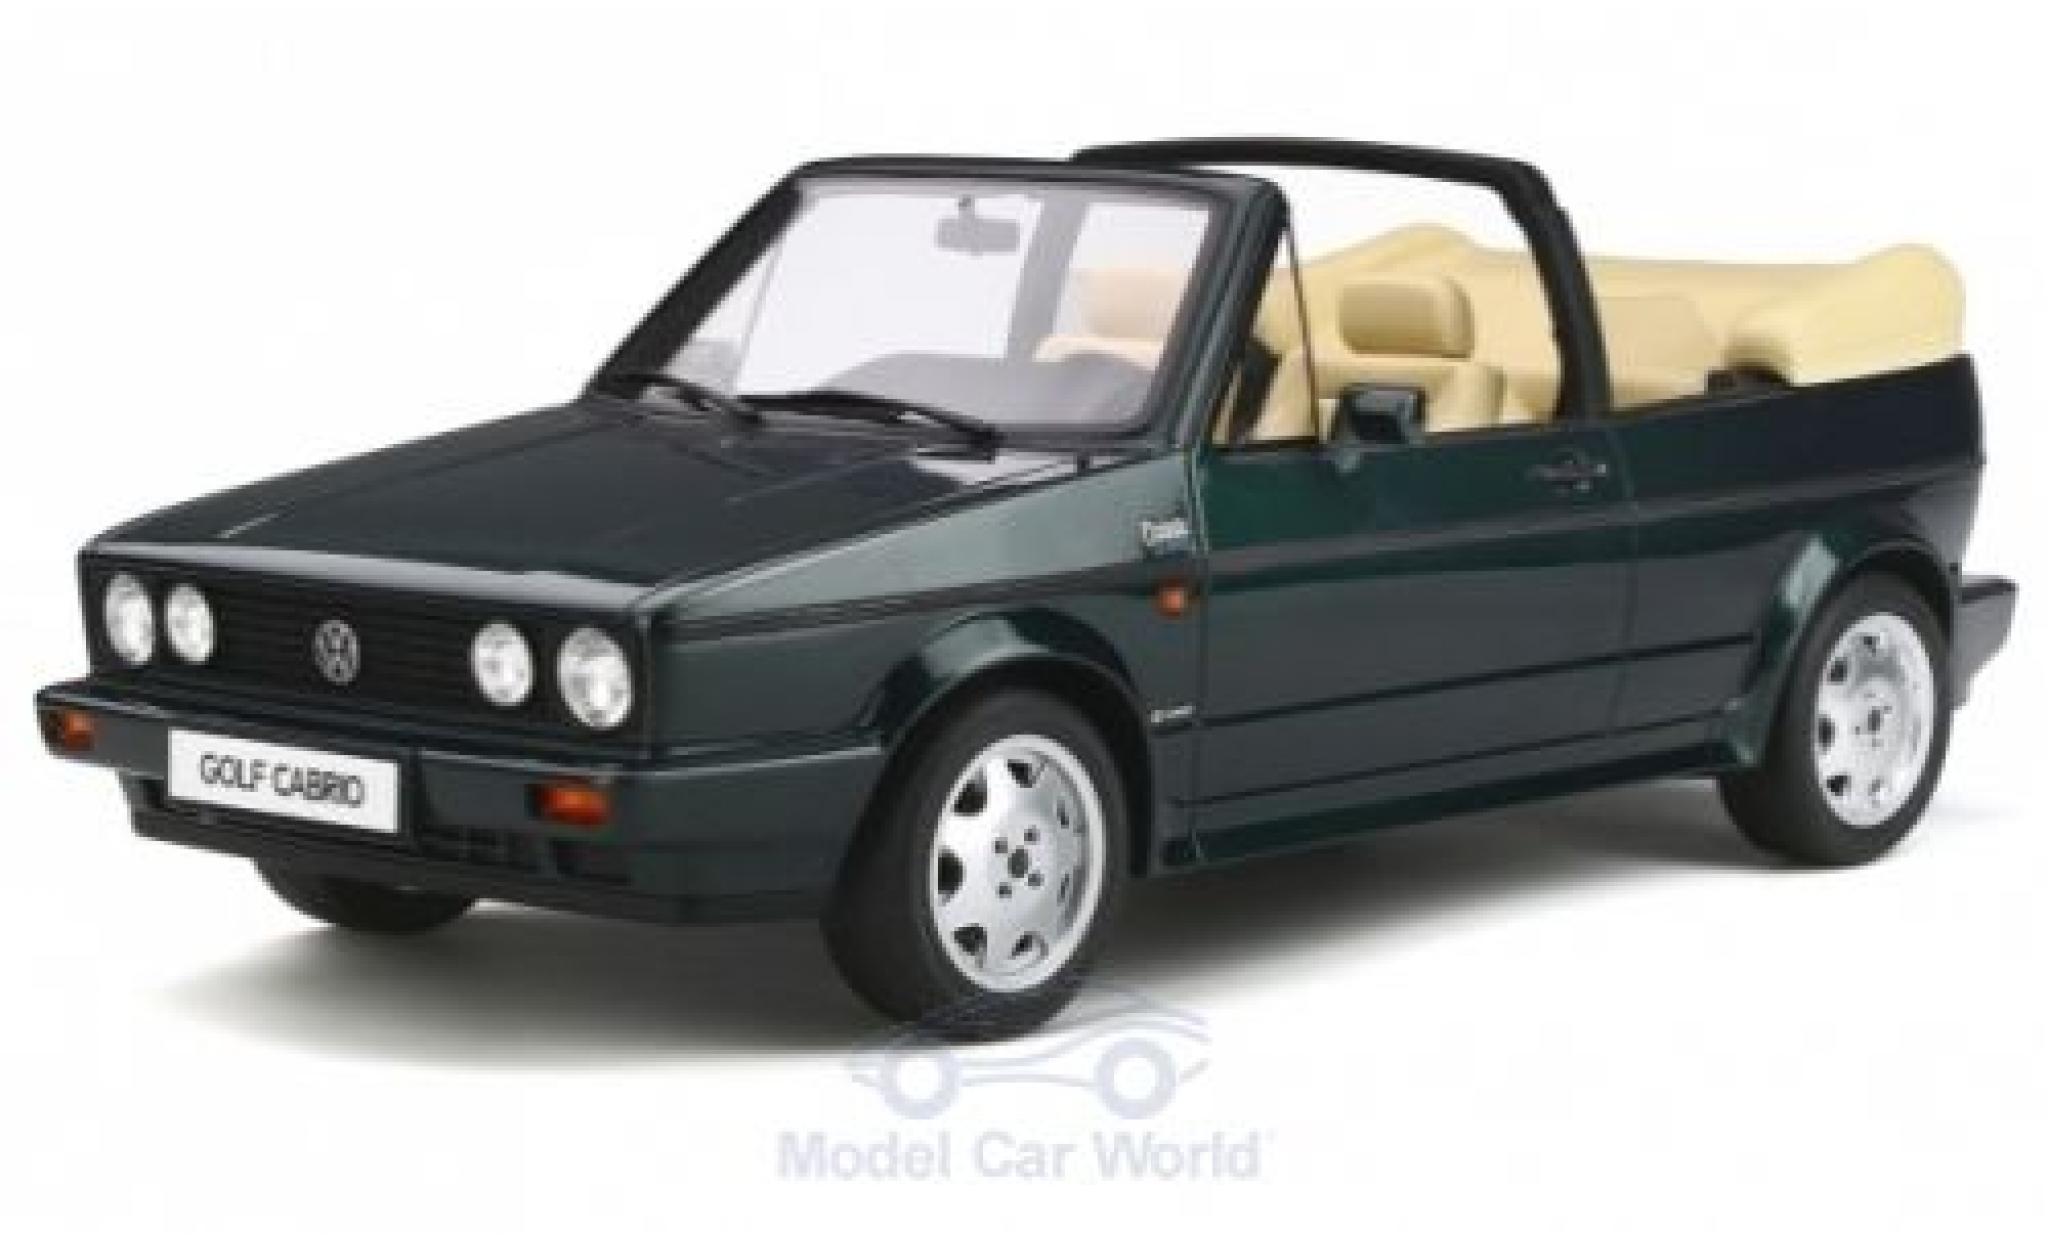 Volkswagen Golf 1/12 Ottomobile I Cabriolet Classic Line metallic green 1992